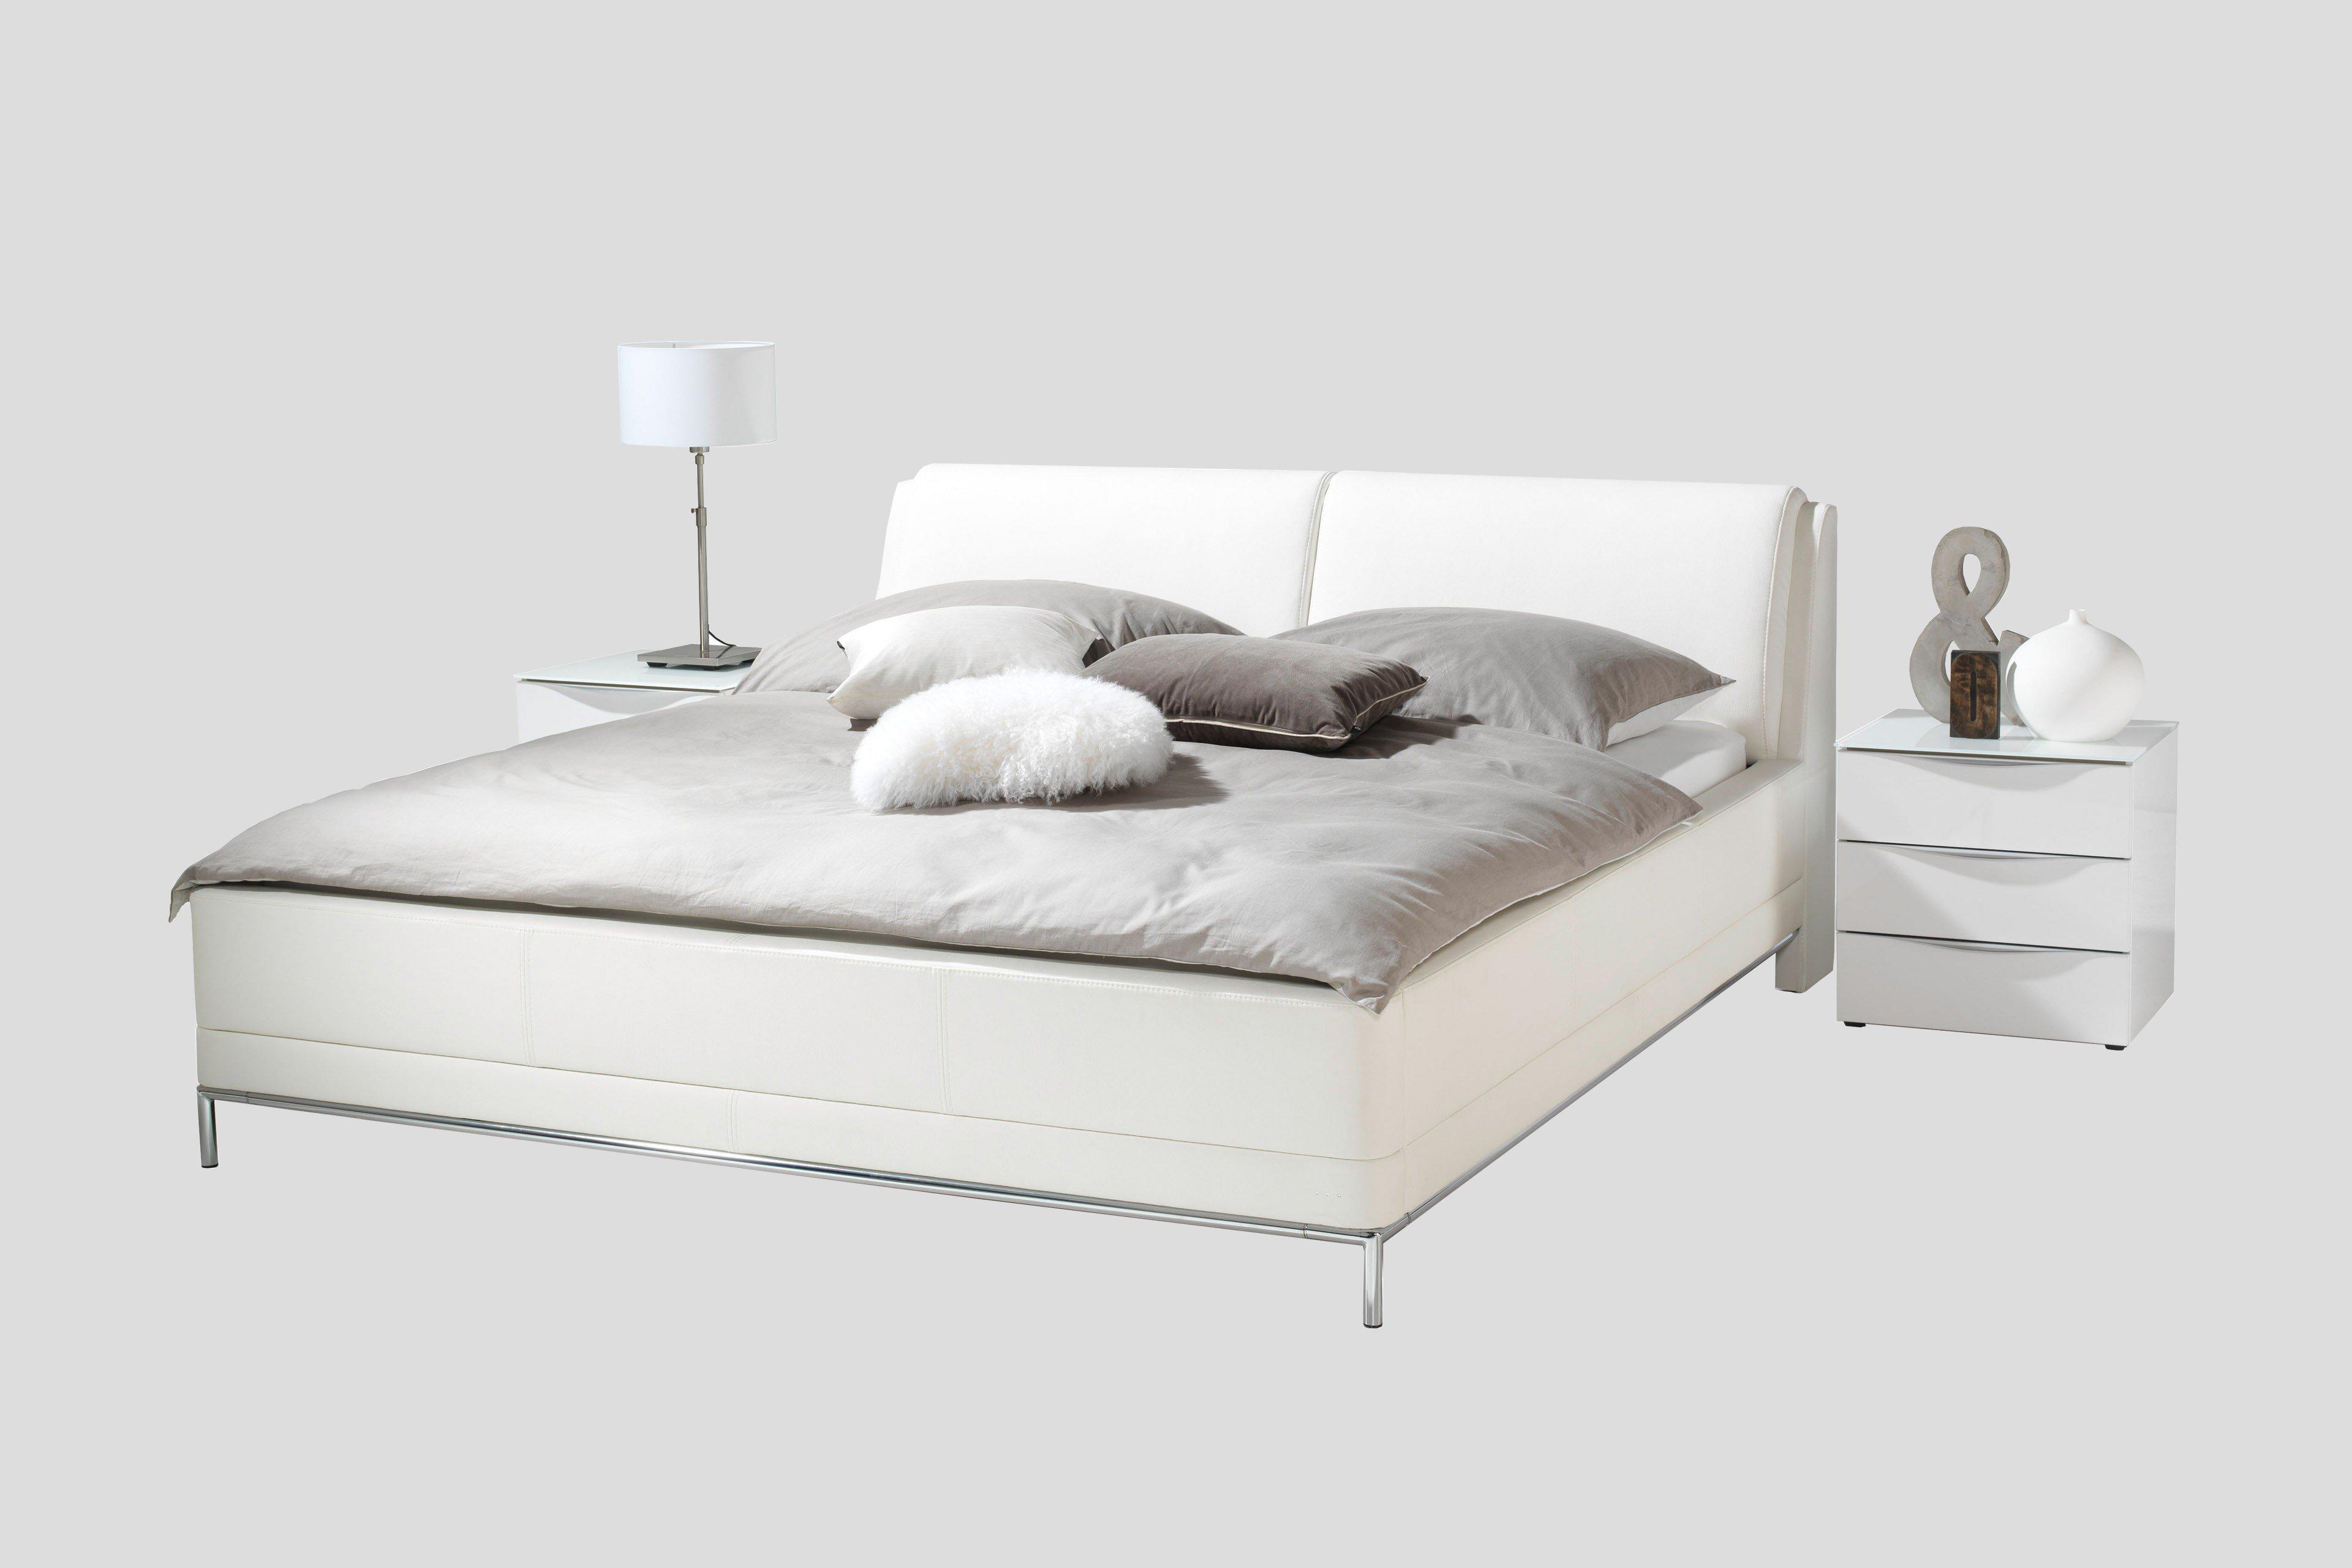 wellem bel polsterbett 06 mood wei m bel letz ihr online shop. Black Bedroom Furniture Sets. Home Design Ideas